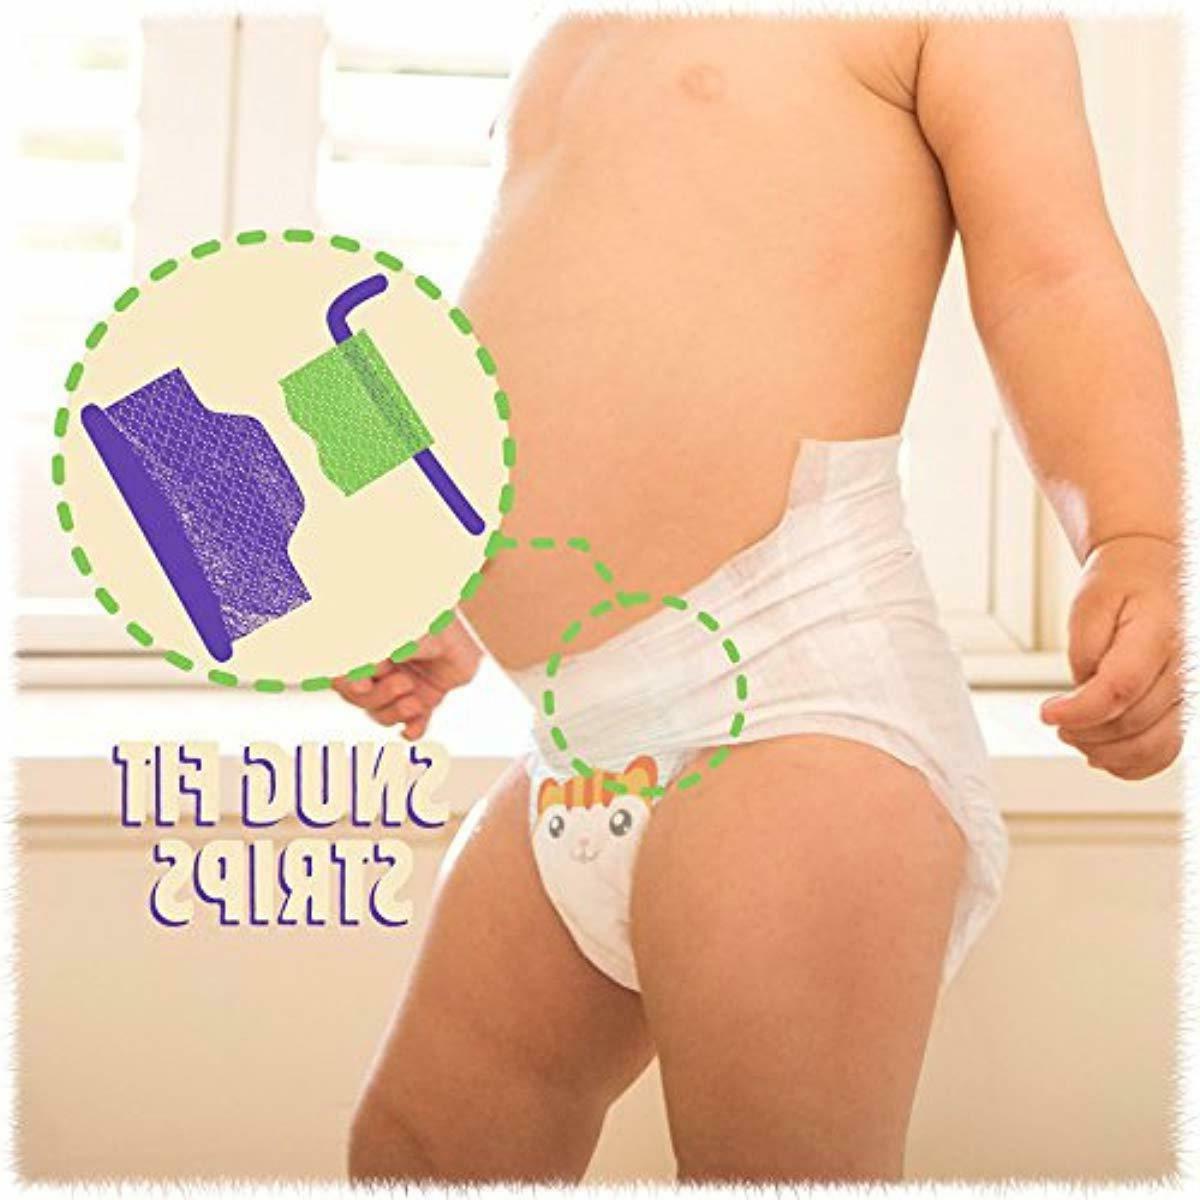 Cuties Baby Diapers, 4, Count